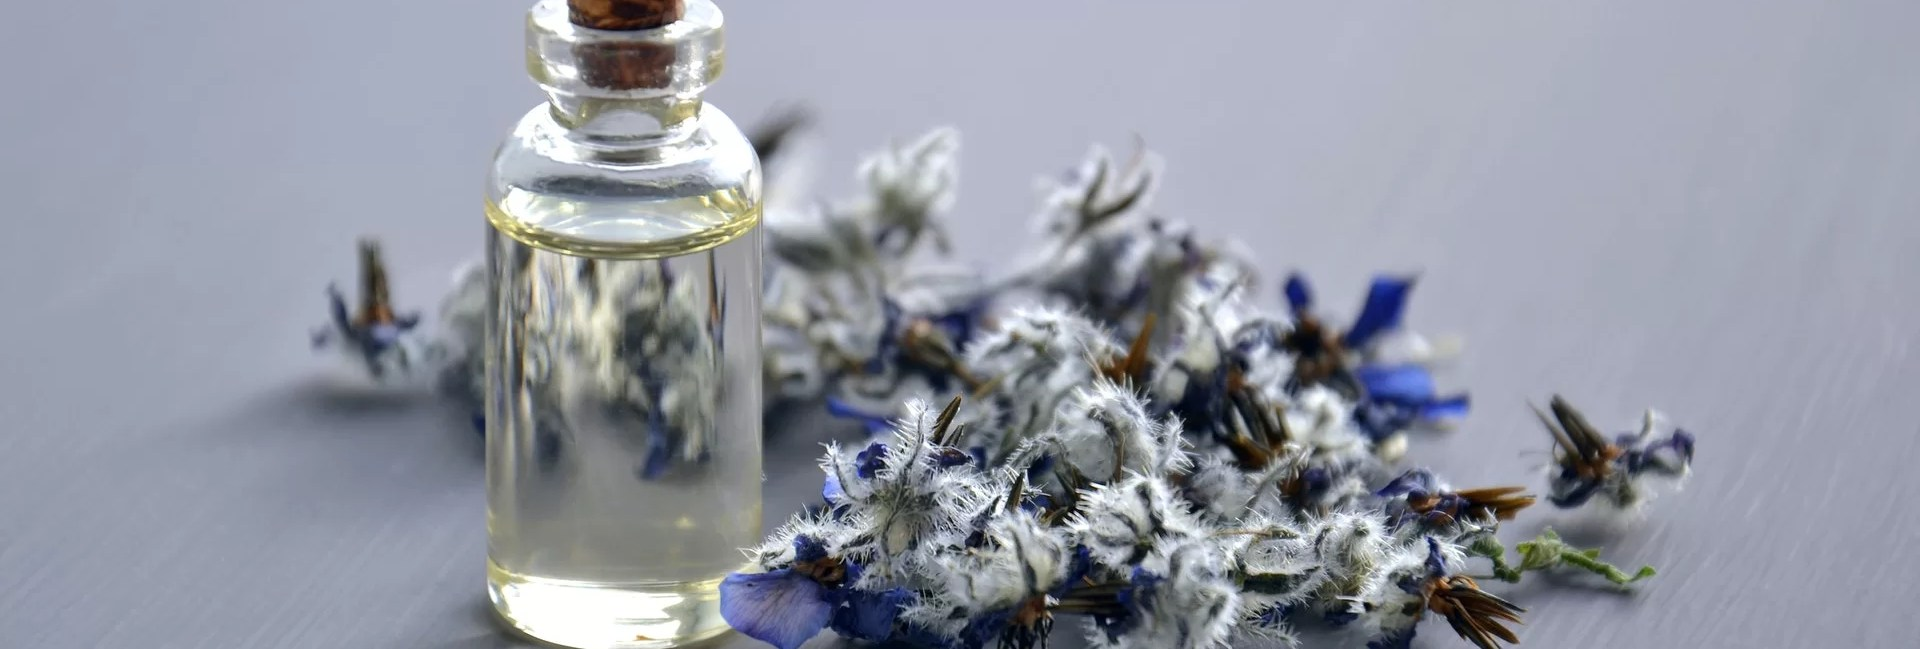 fleurs de bach : se soigner